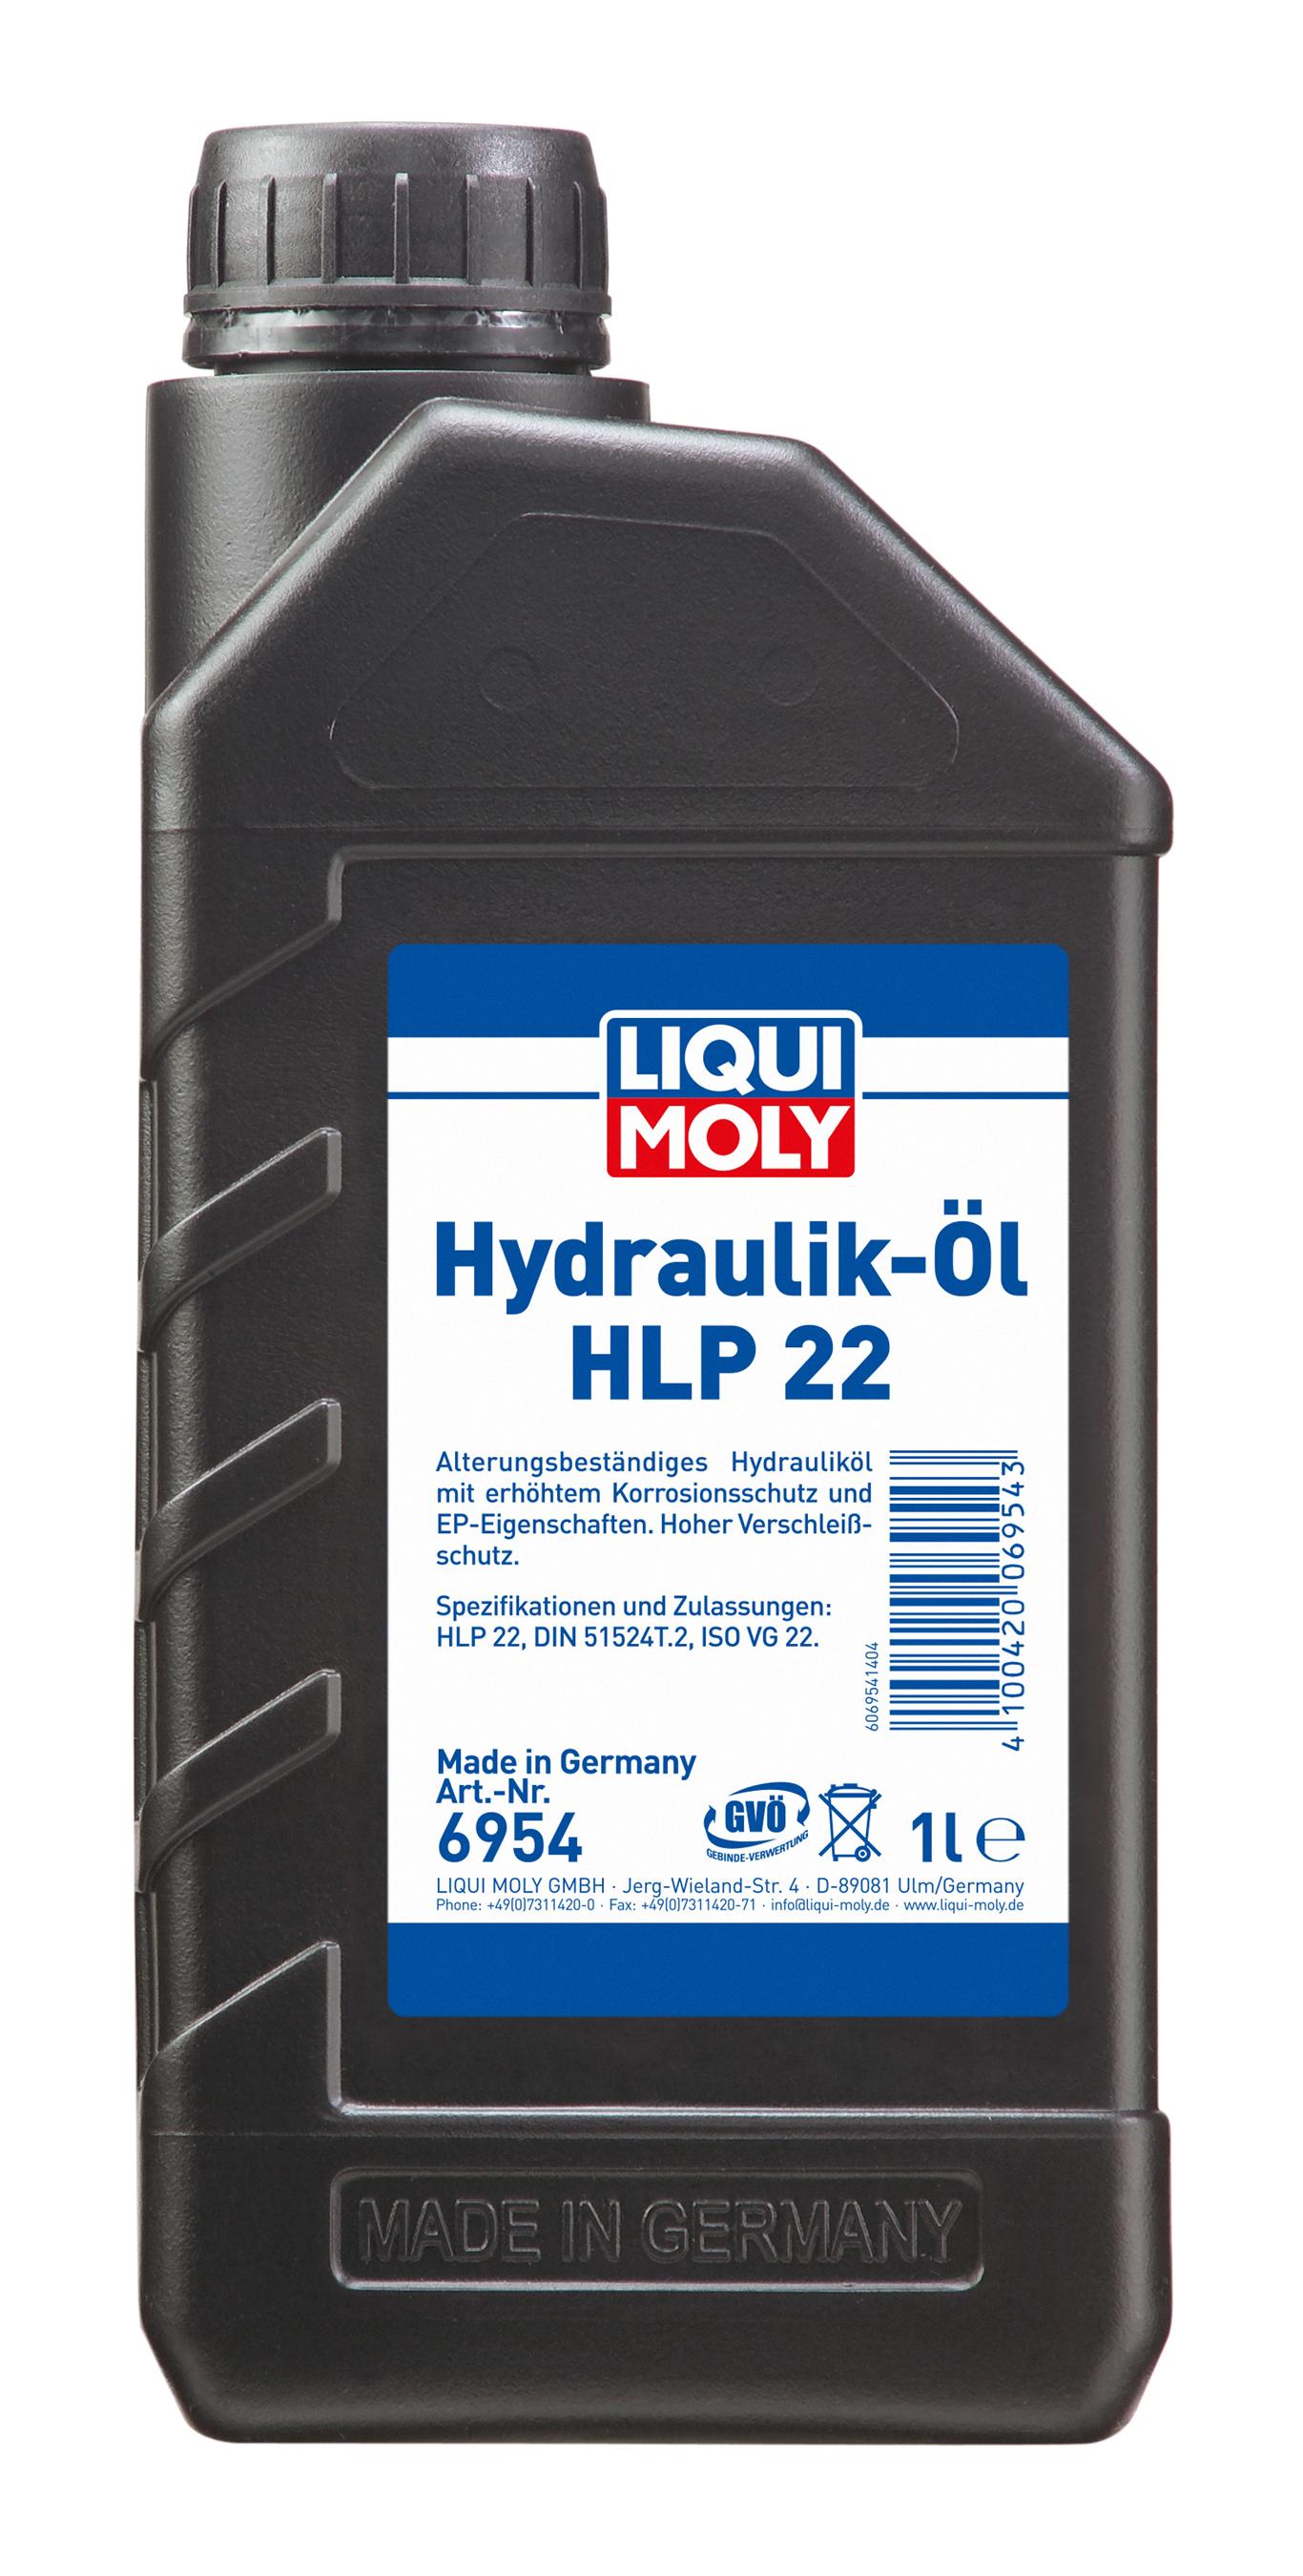 Liqui Moly Hydrauliköl HLP 22  1 Liter Bild 1